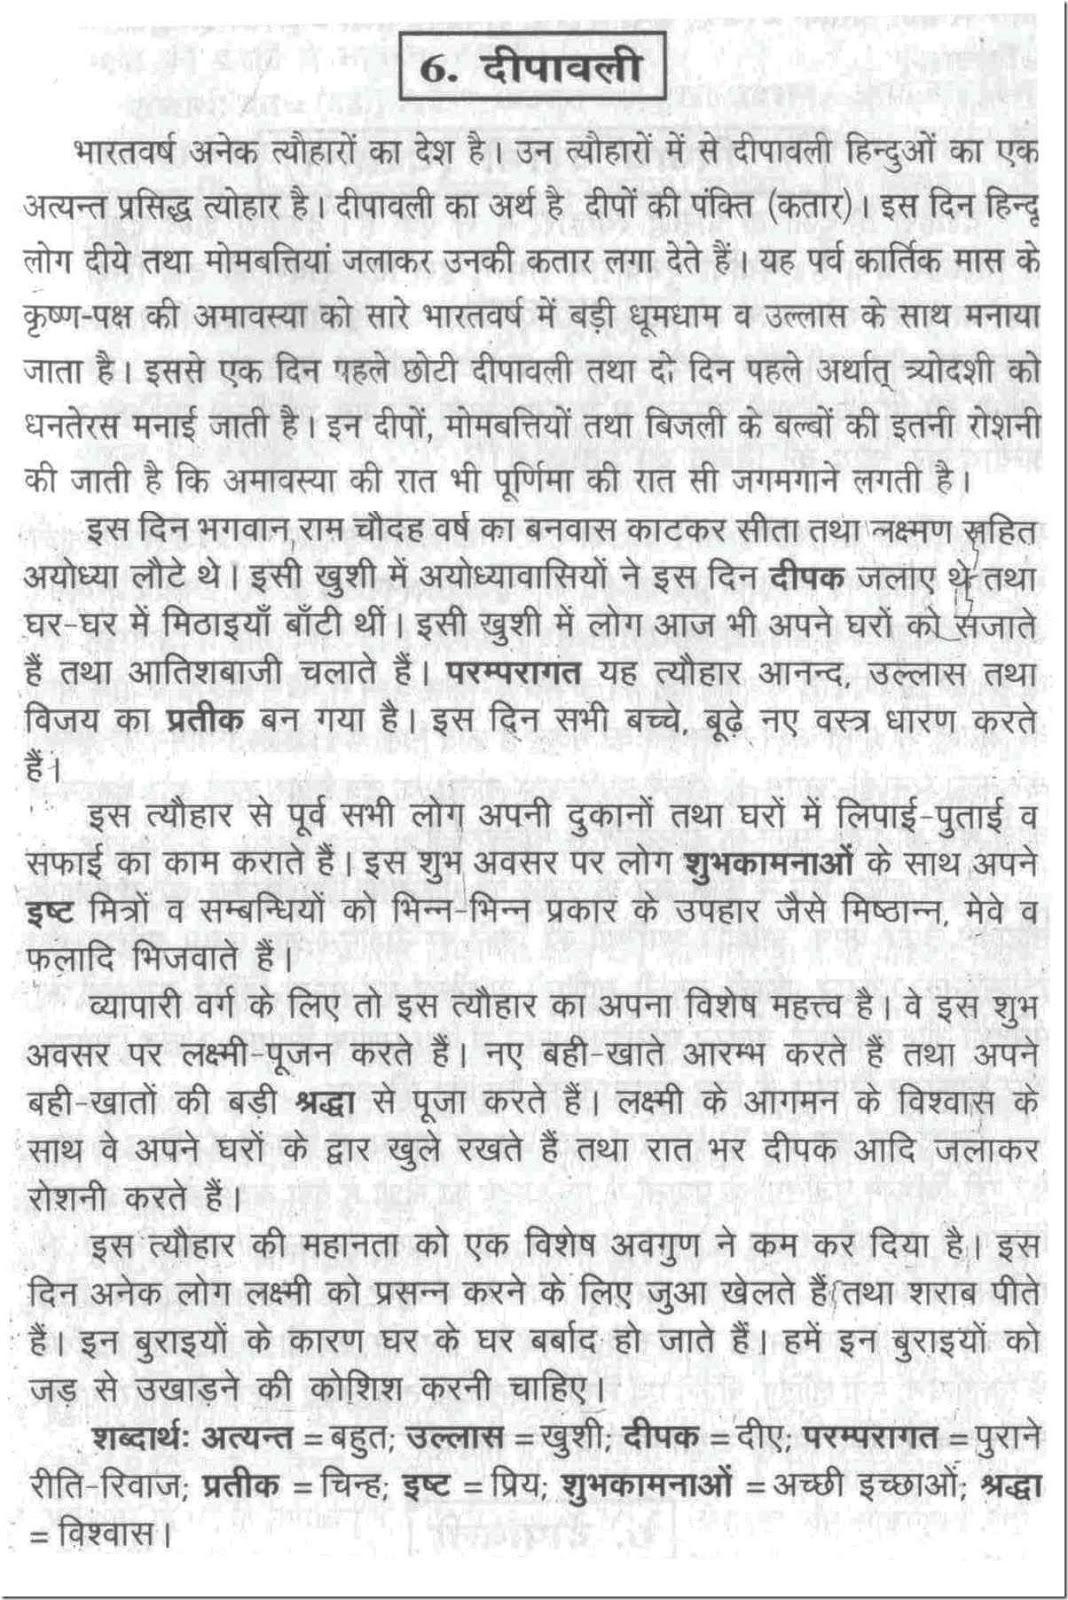 004 2bdiwali2bfestival2bessay2bin2bhindi2b2b252812529 Essay For Diwali In Hindi Fantastic On 50 Words Class Short 3 Full